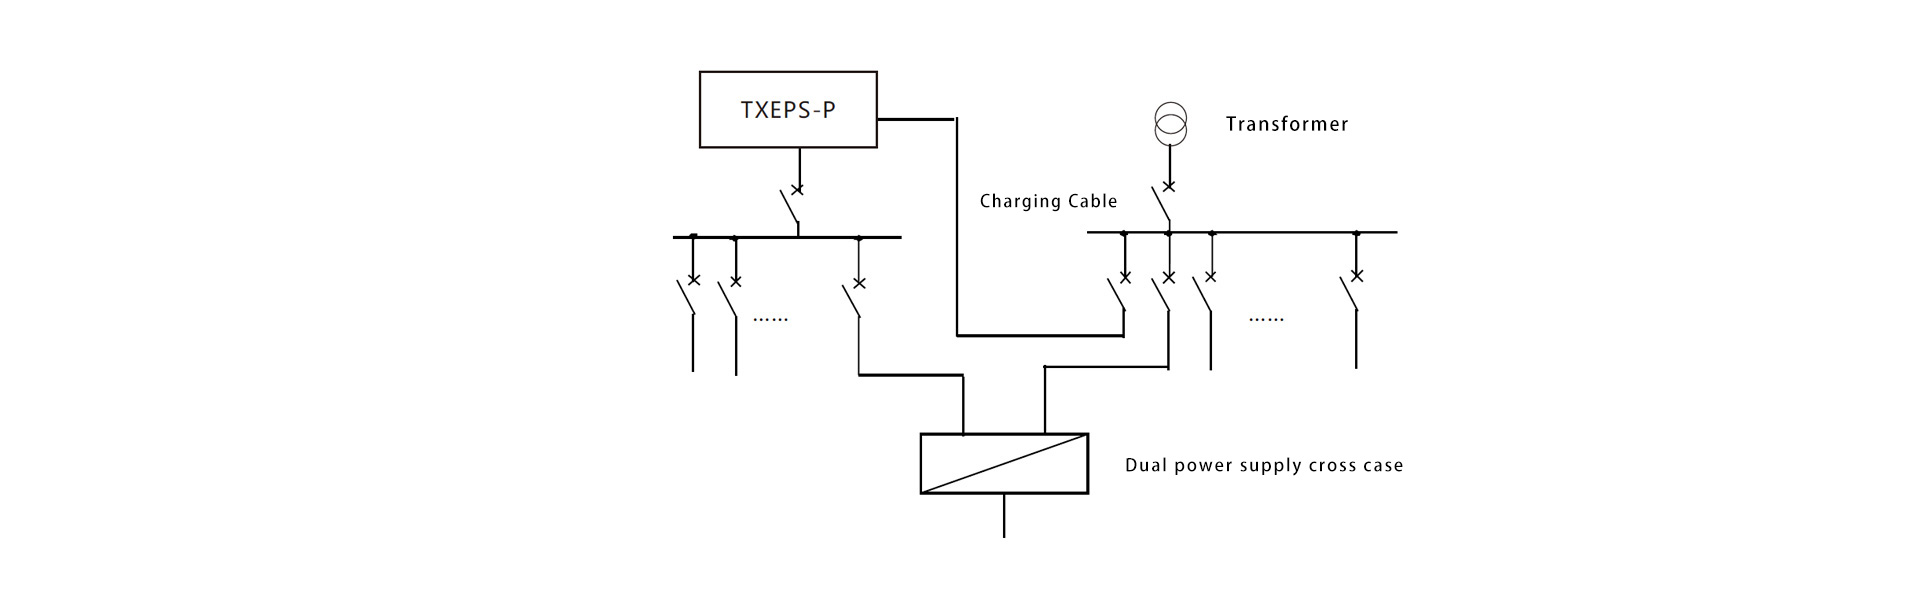 Notstromanlagen & EPS Notstromversorgung - TAIXI Electric